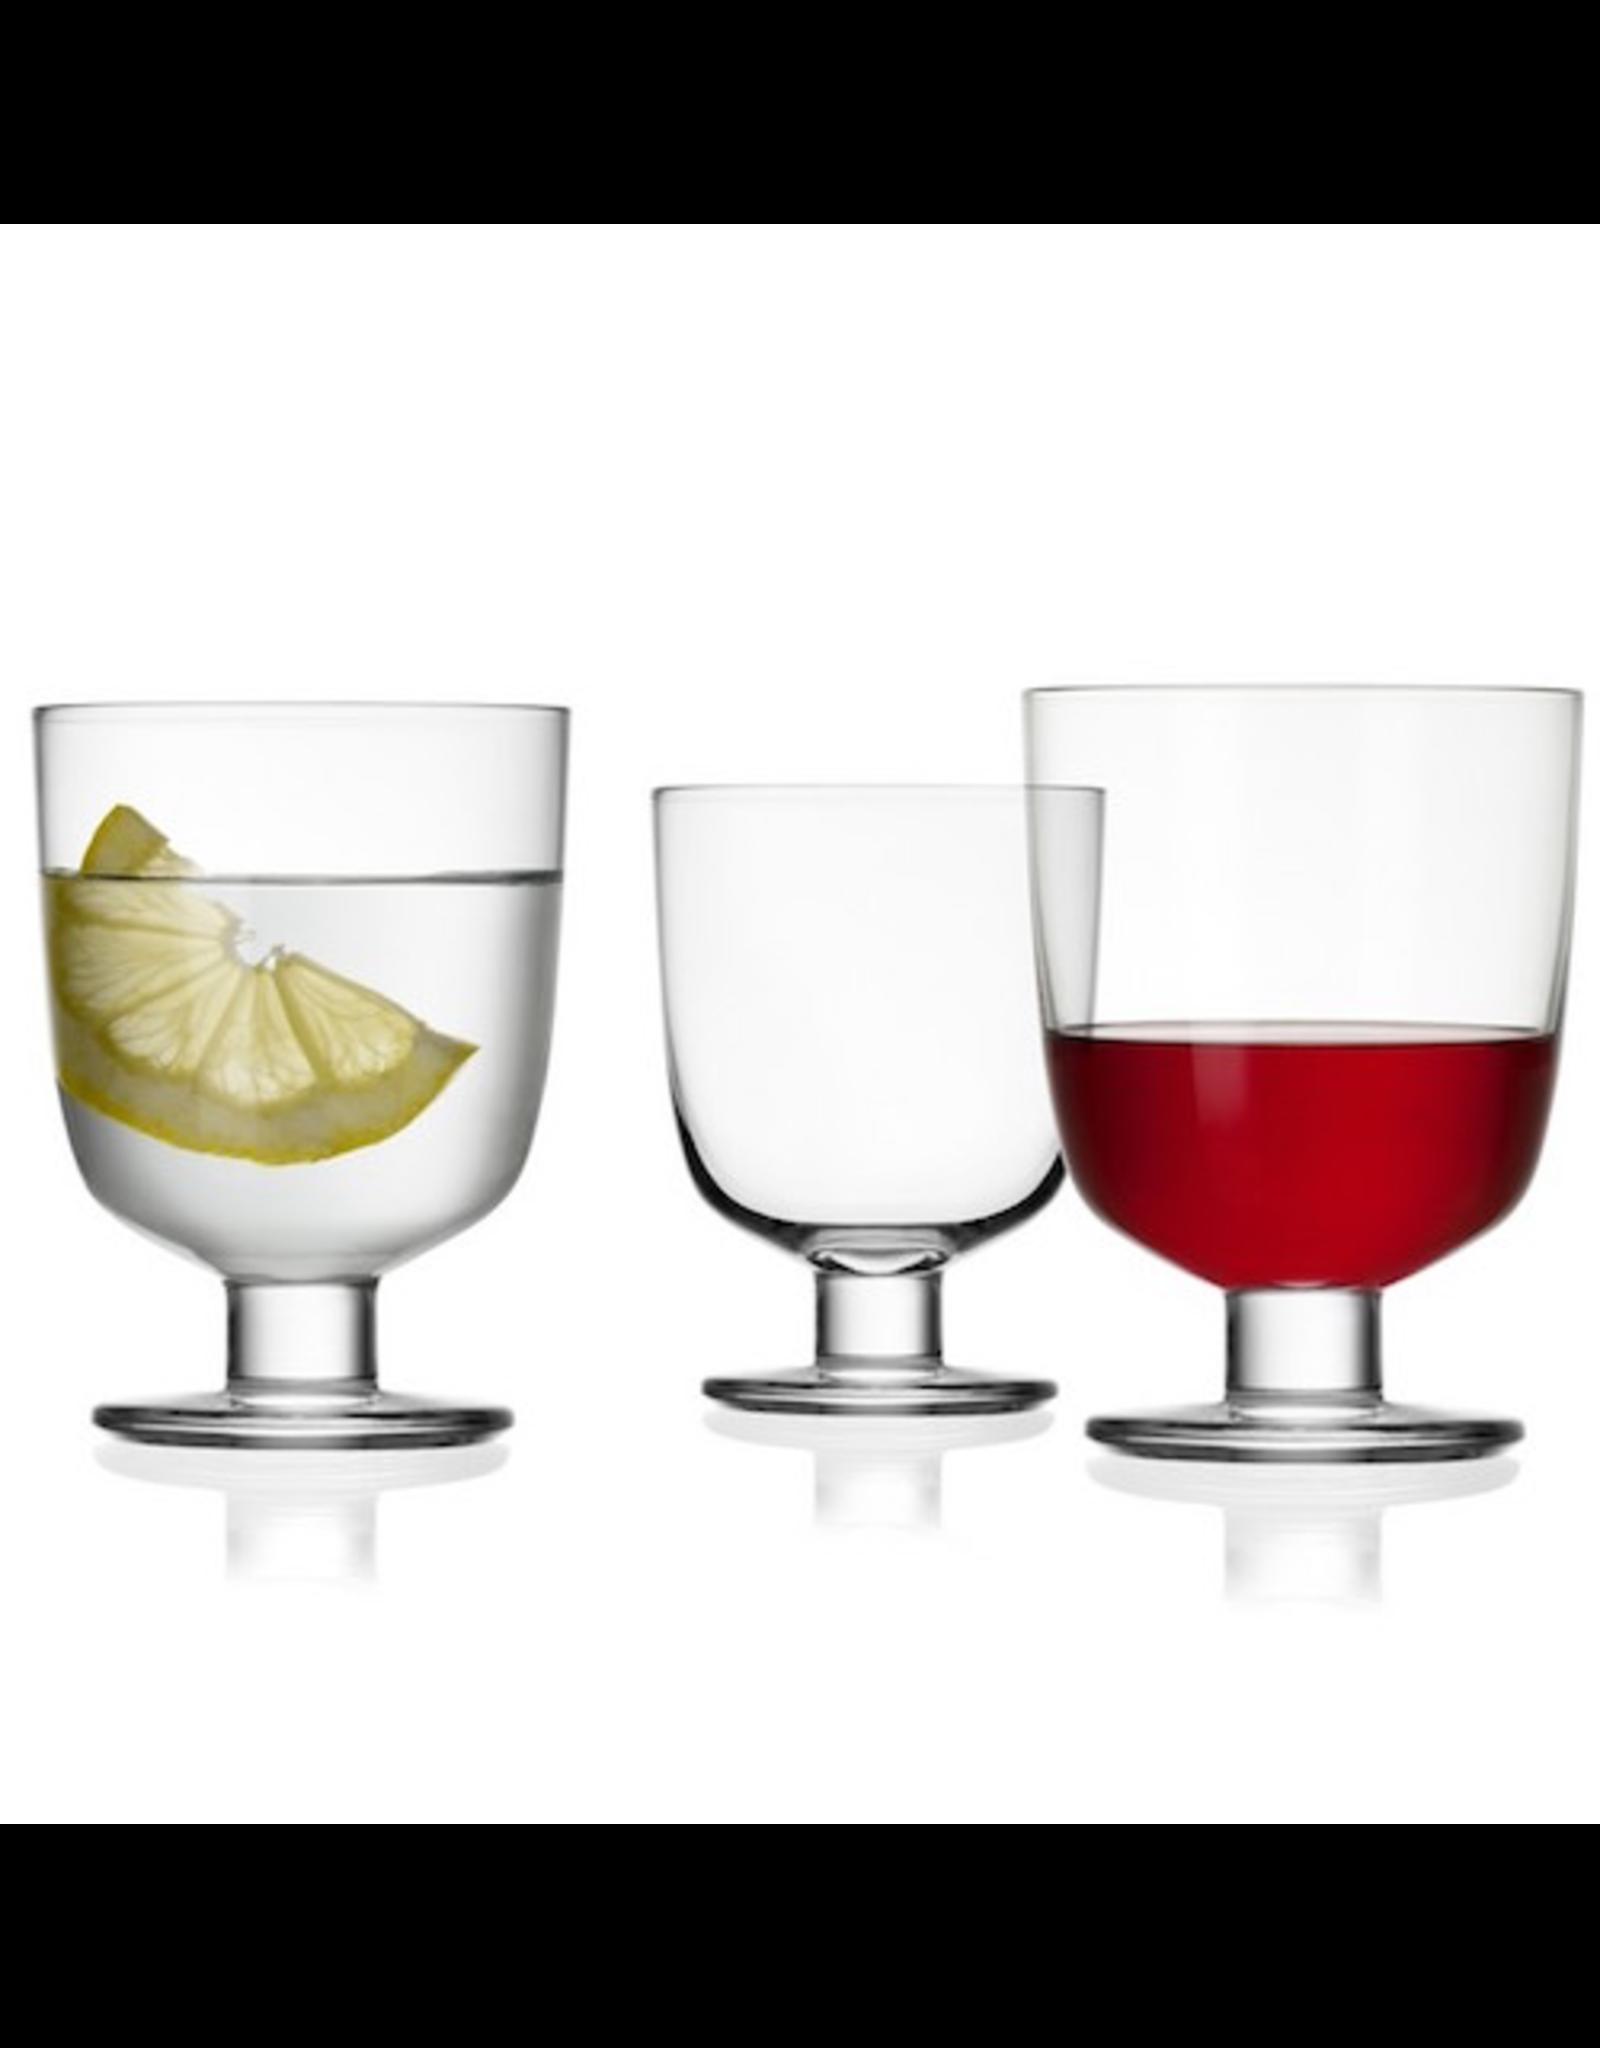 LEMPI GLASS